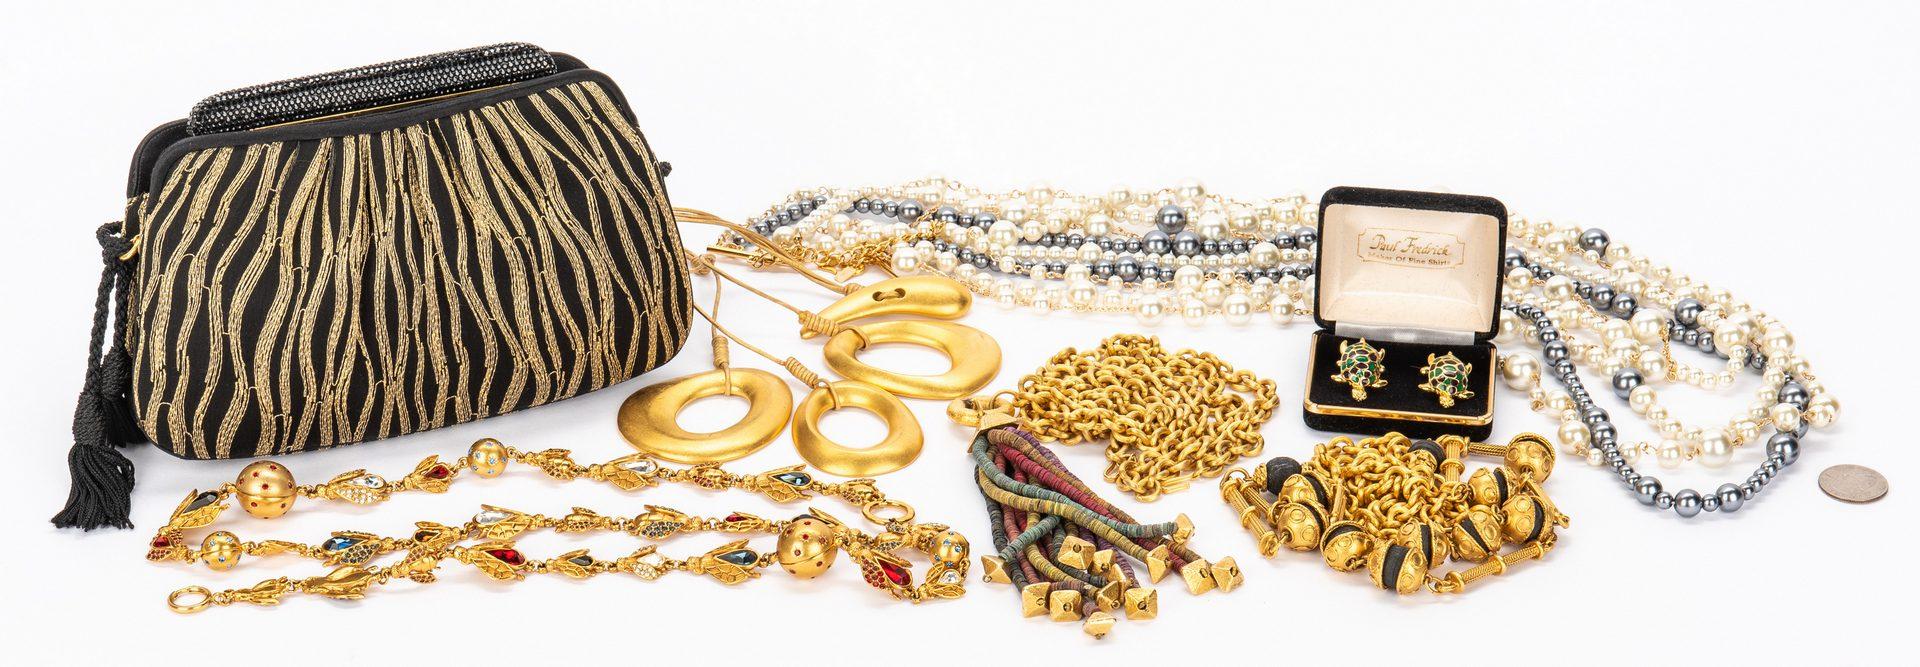 Lot 424: 7 Designer Items, incl. Leiber, Dior, Karan, Lane